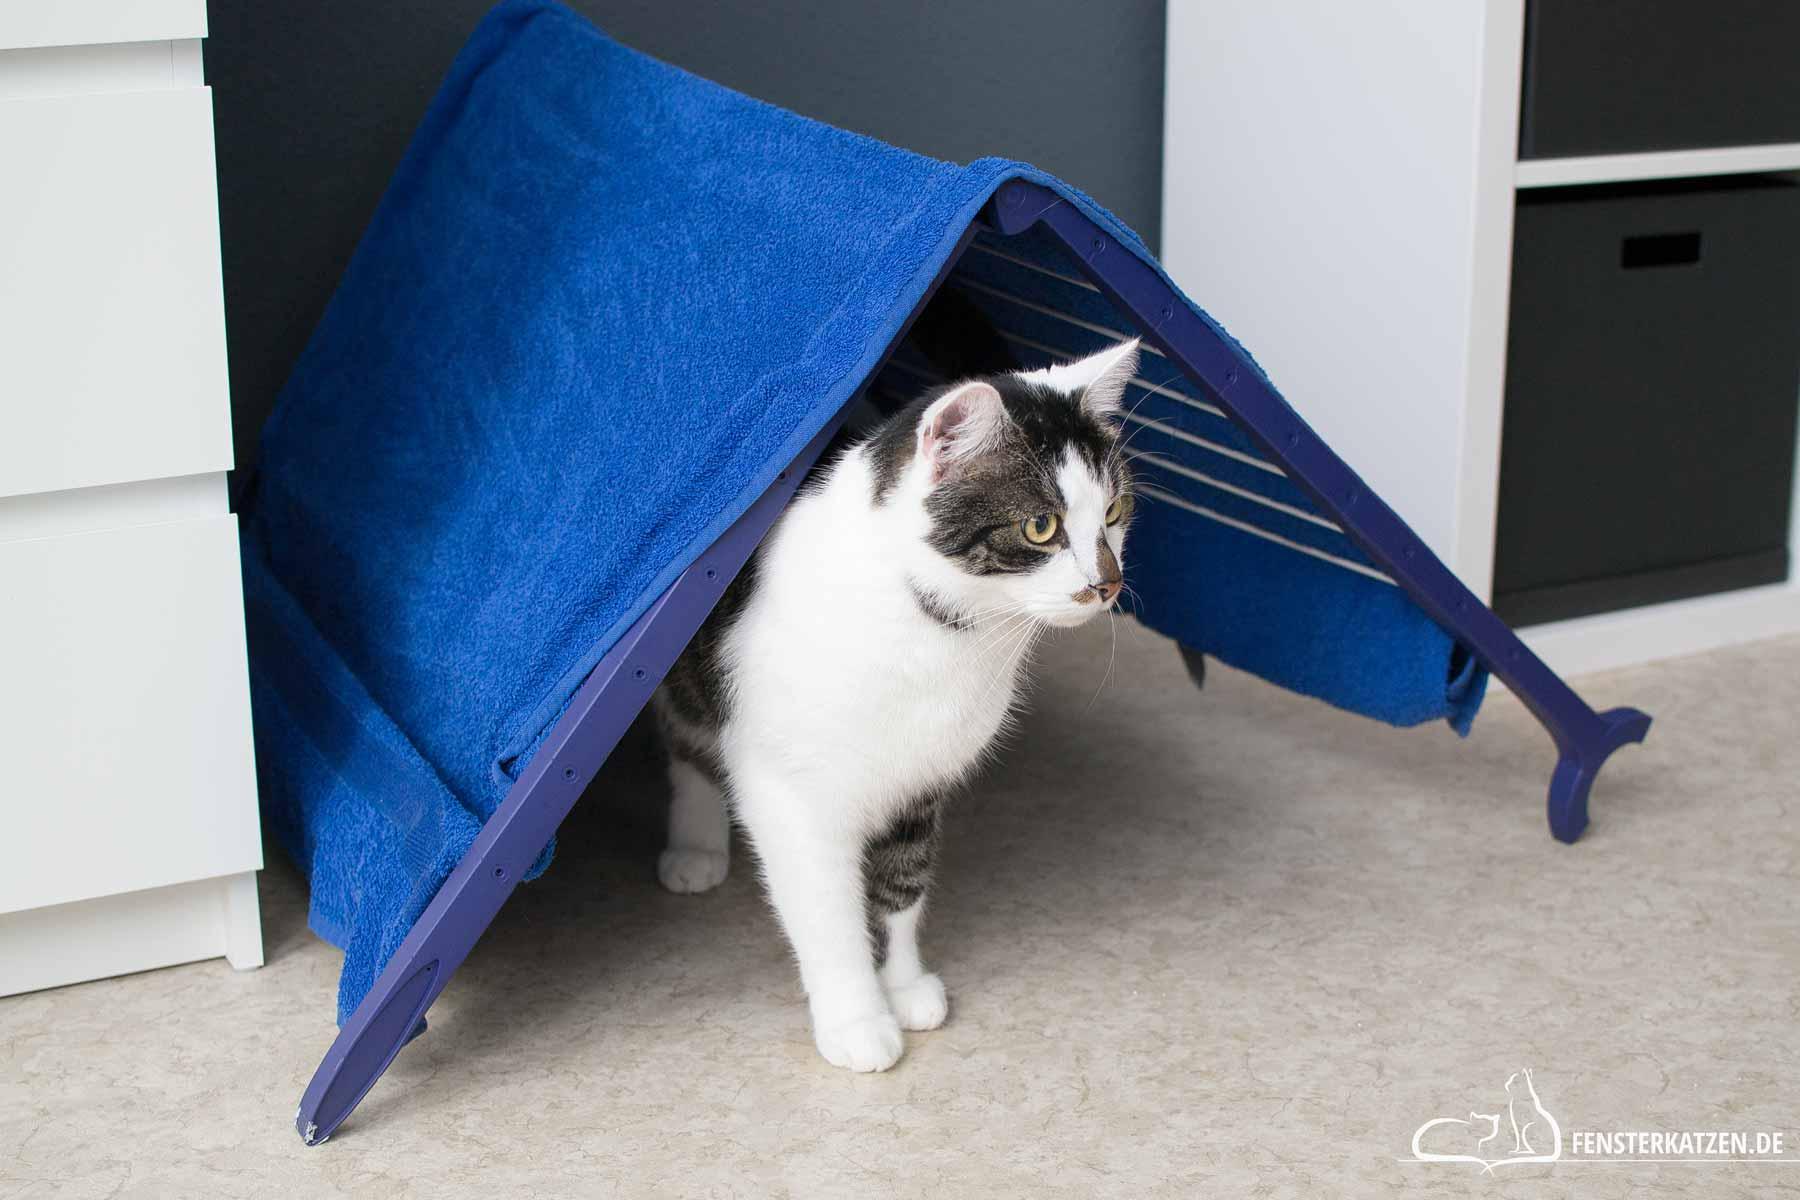 Fensterkatzen-Ratgeber-Abkuehlung-Katze-Tipps-Hitze-Heisse-Tage-Titelbild